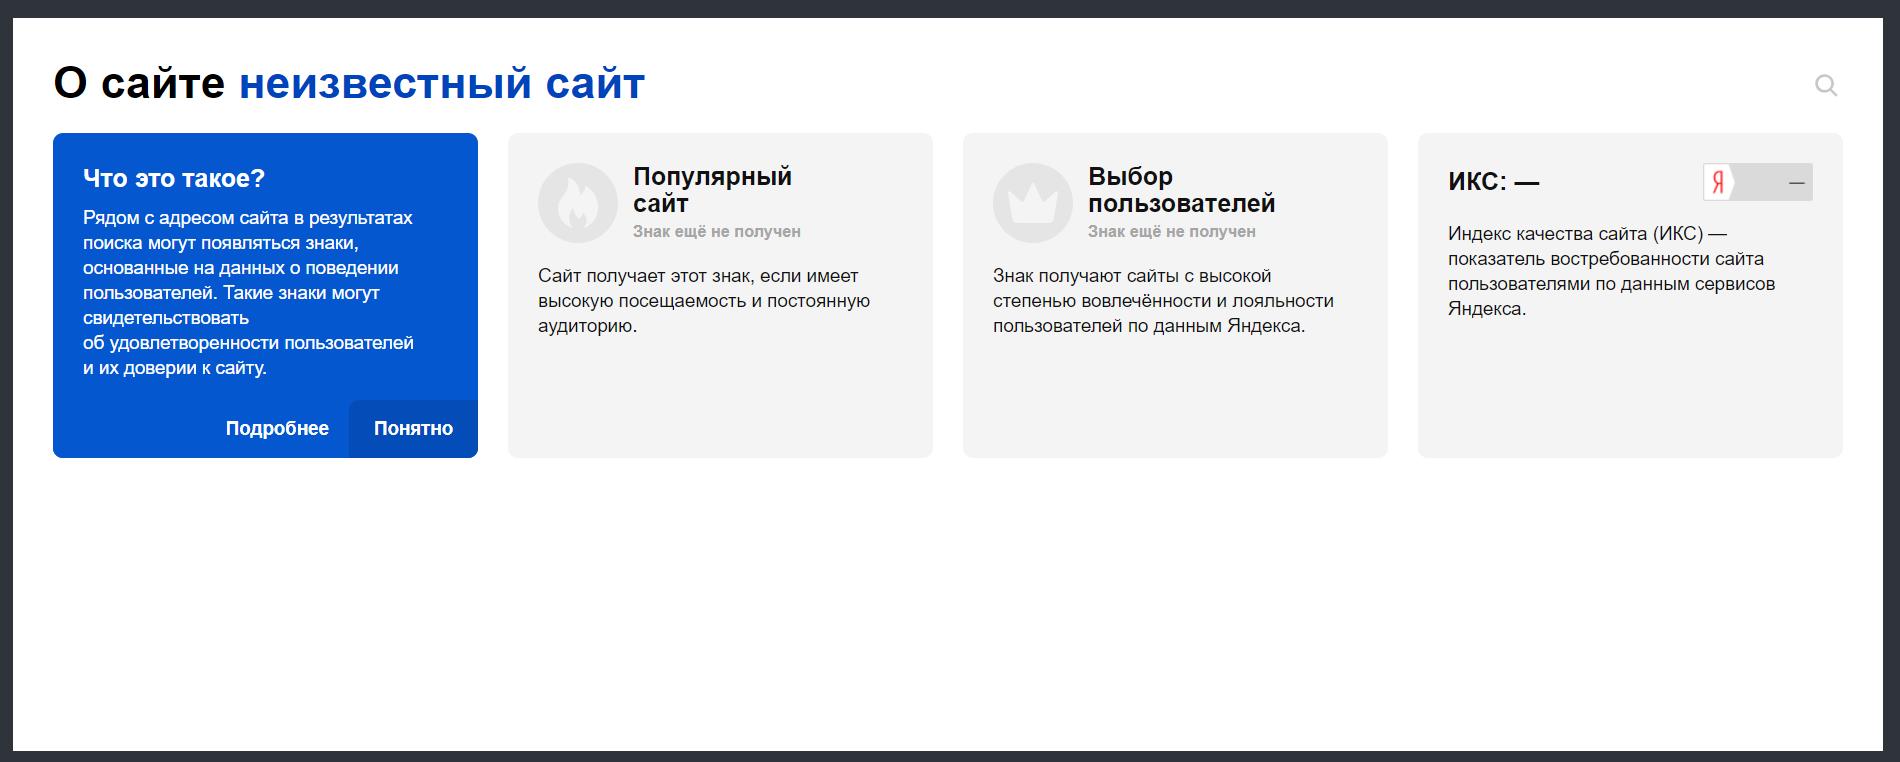 Яндекс значки для сайта